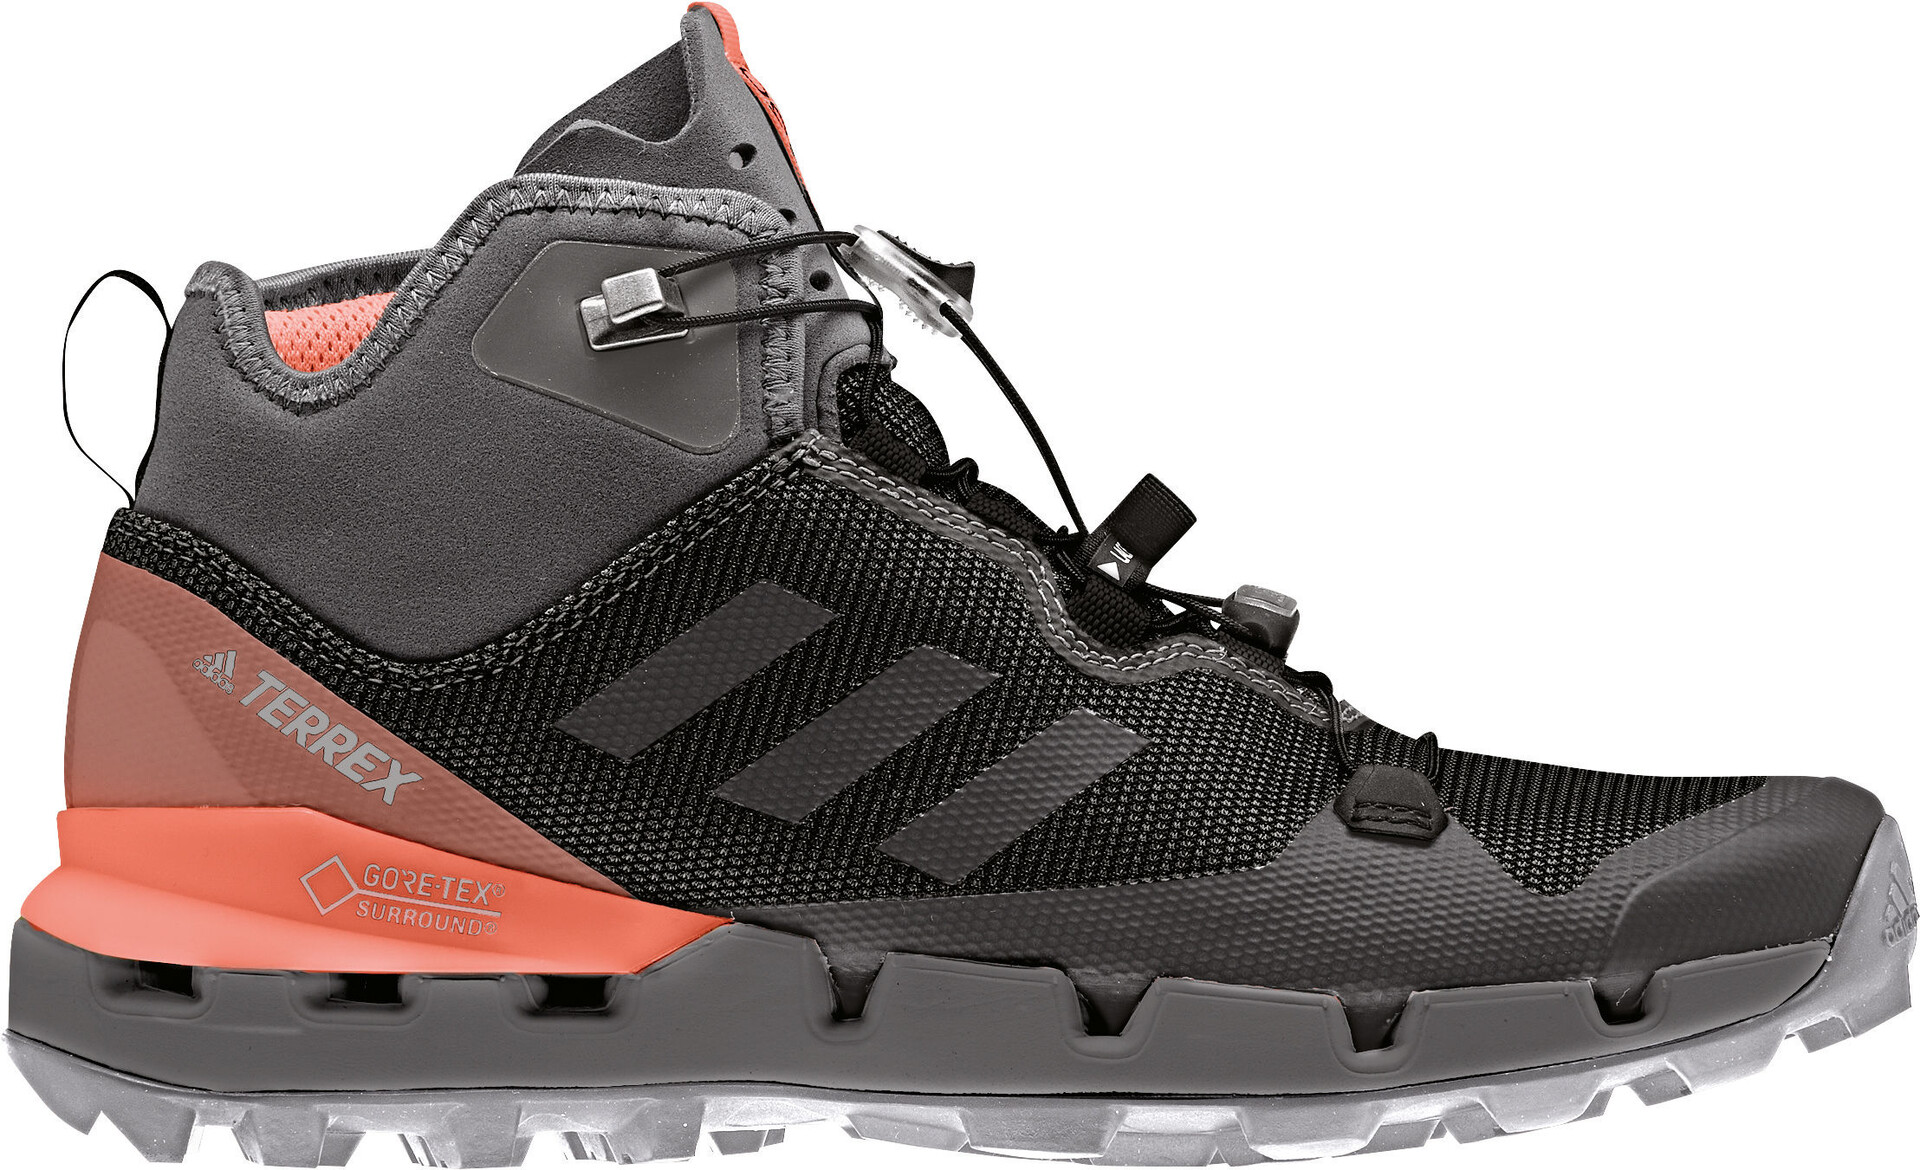 adidas TERREX Fast Mid GTX Schoenen Dames, core blackgrey fivechalk coral